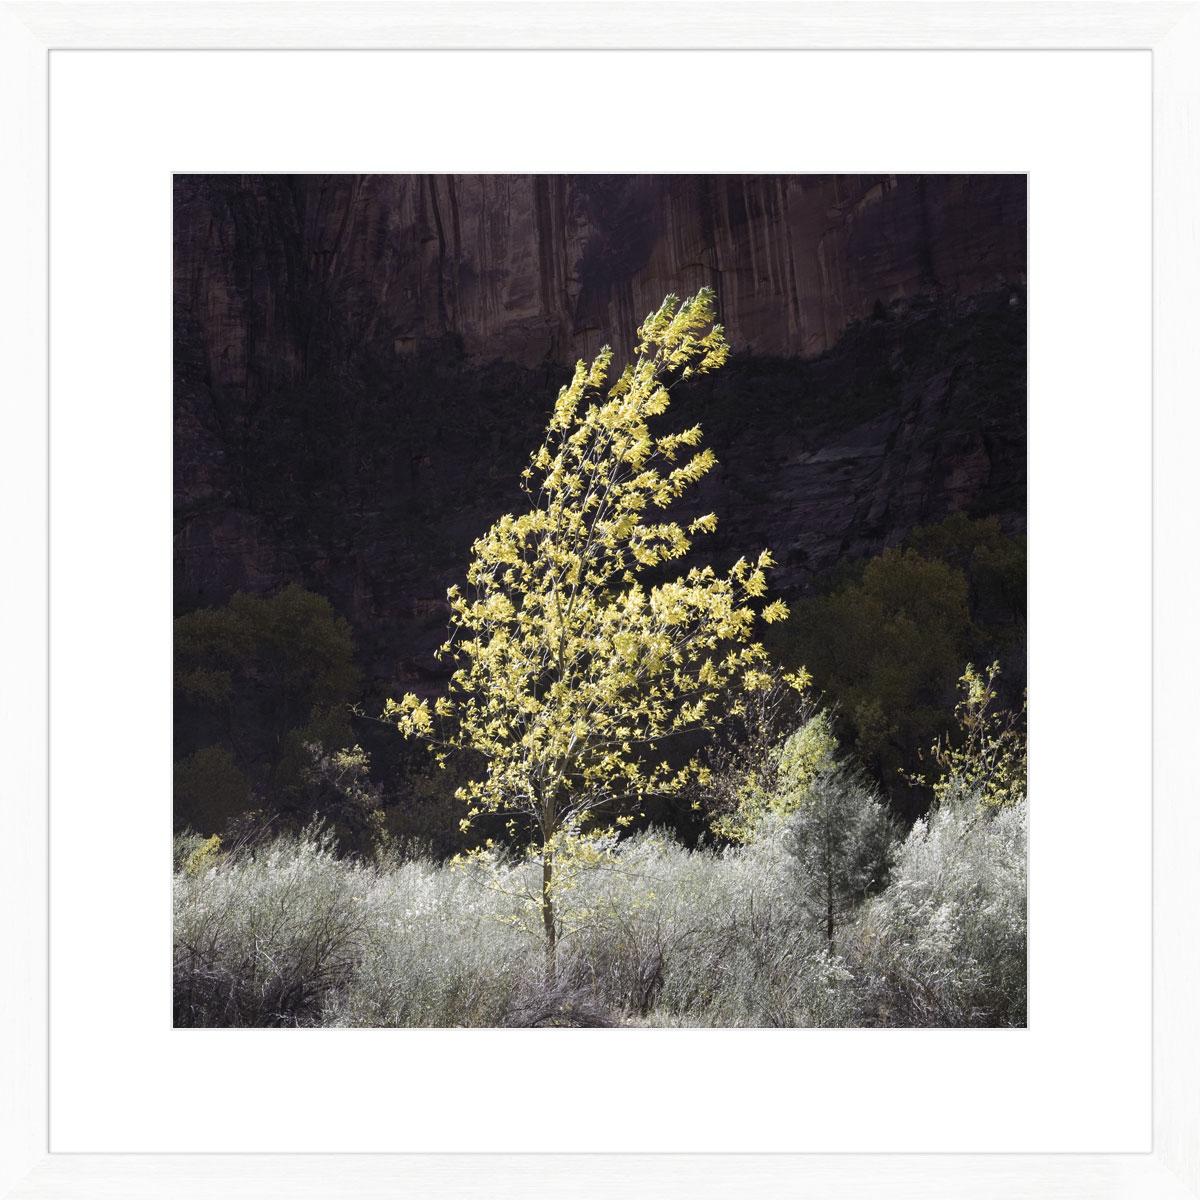 Bling-photographic-print-white